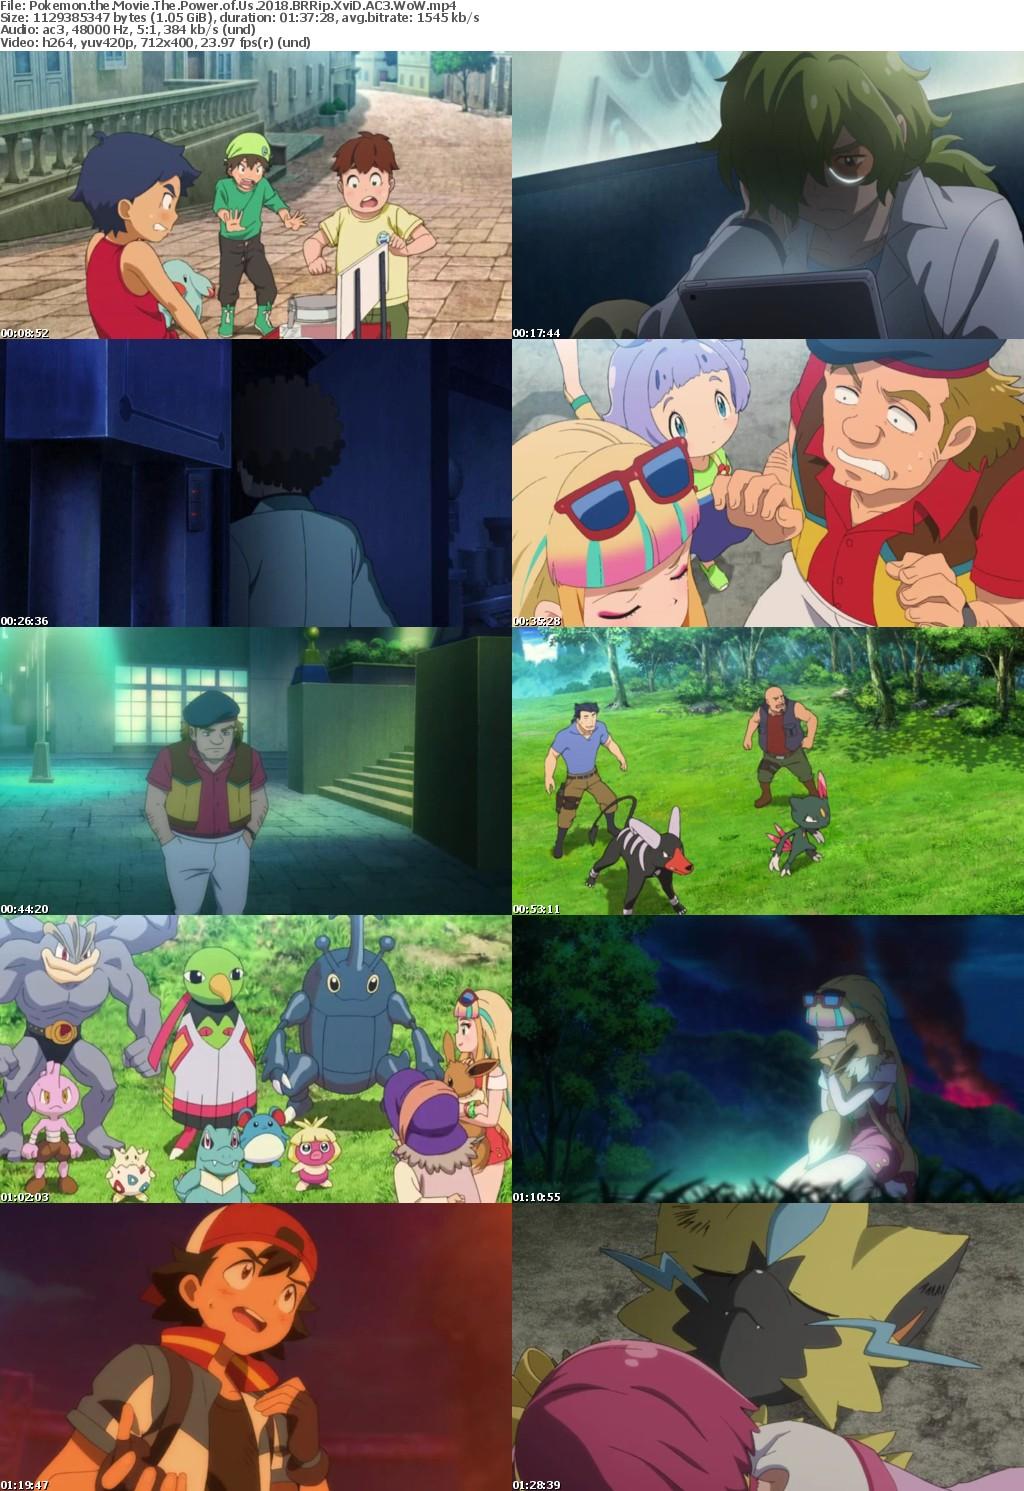 Pokemon the Movie The Power of Us 2018 BRRip XviD AC3 WoW